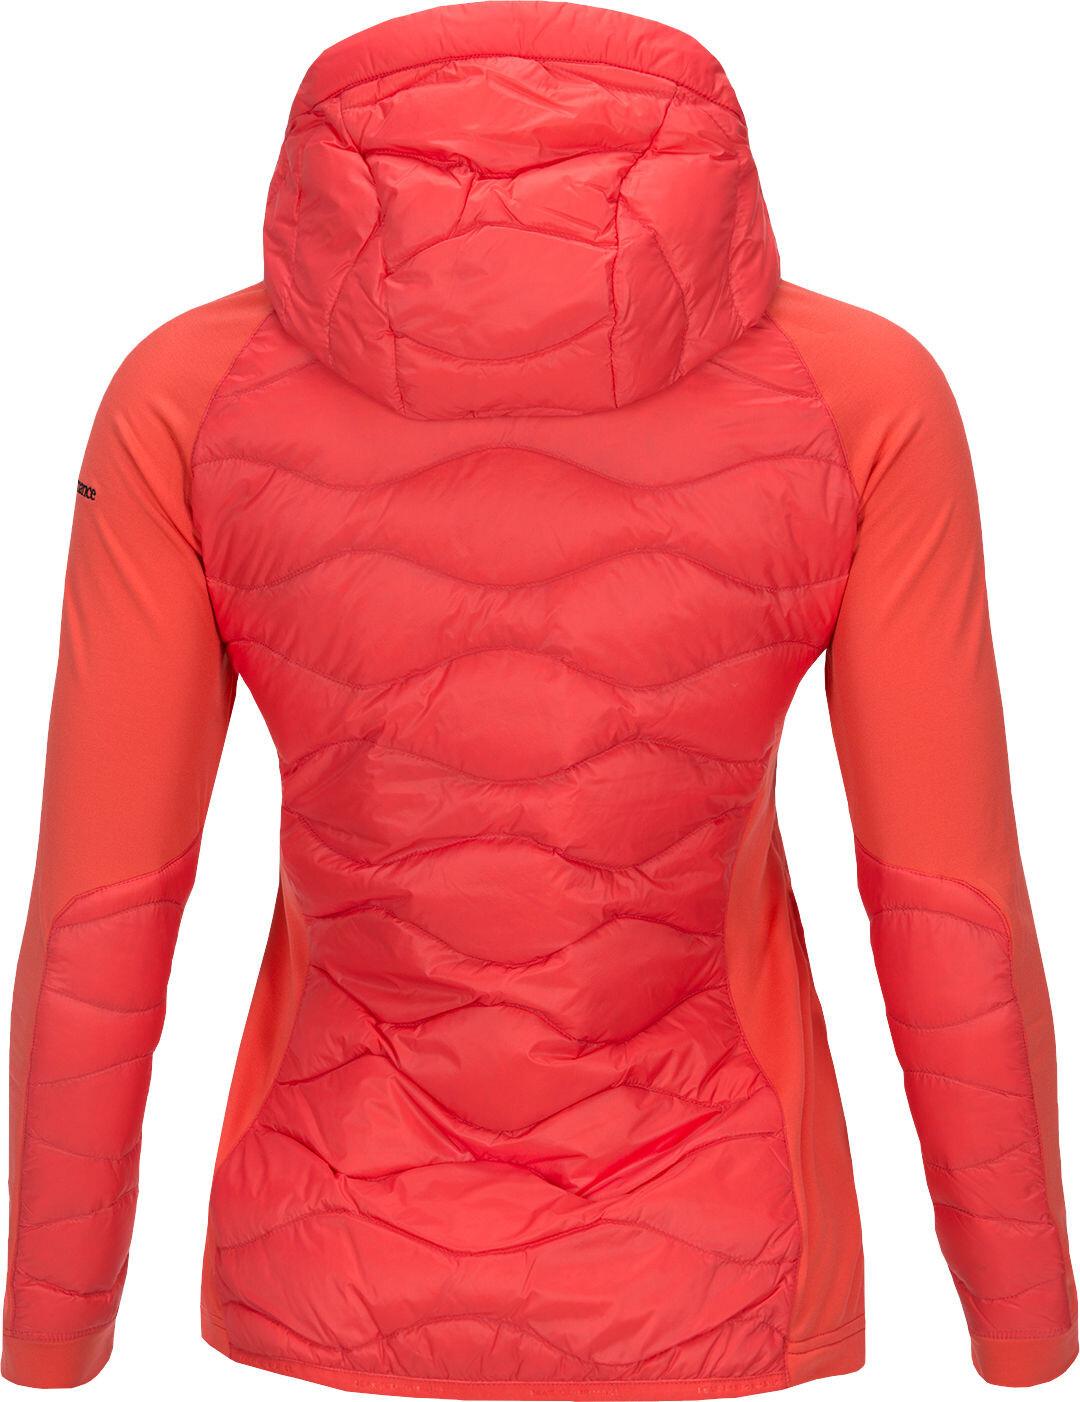 Peak Performance Helium Jacket Women orange pink at Addnature.co.uk 27da27c38f